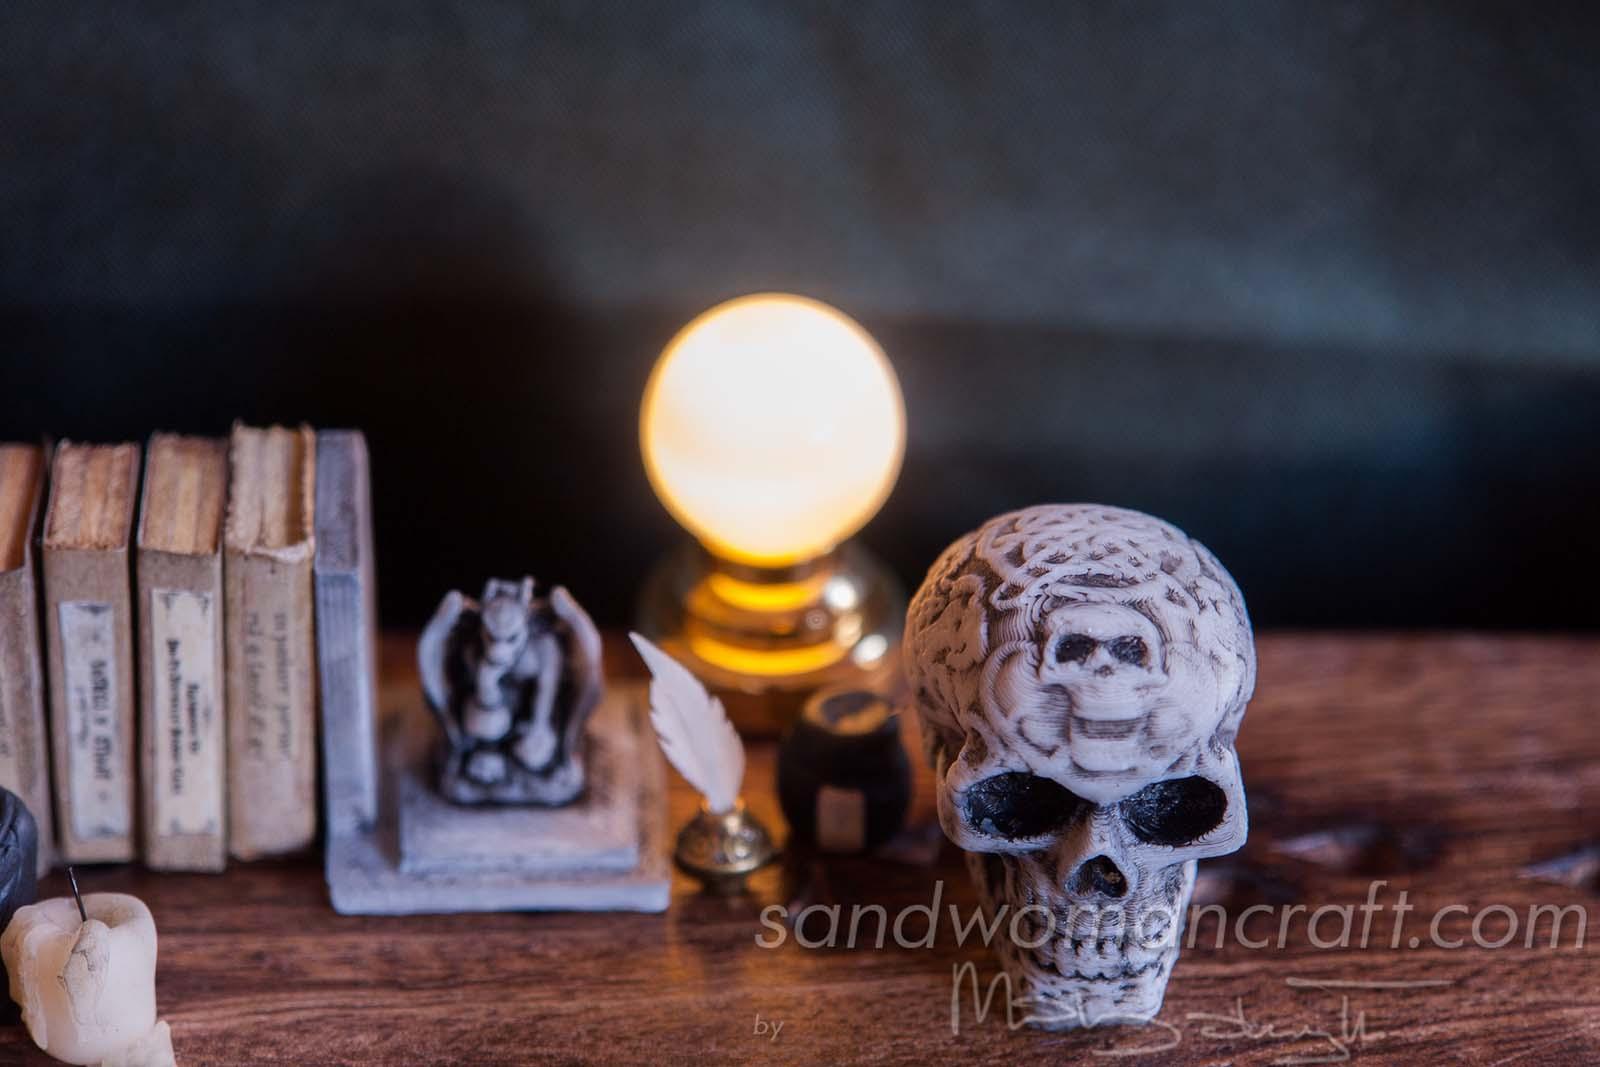 Miniature celtic skull, candles, book, lamp